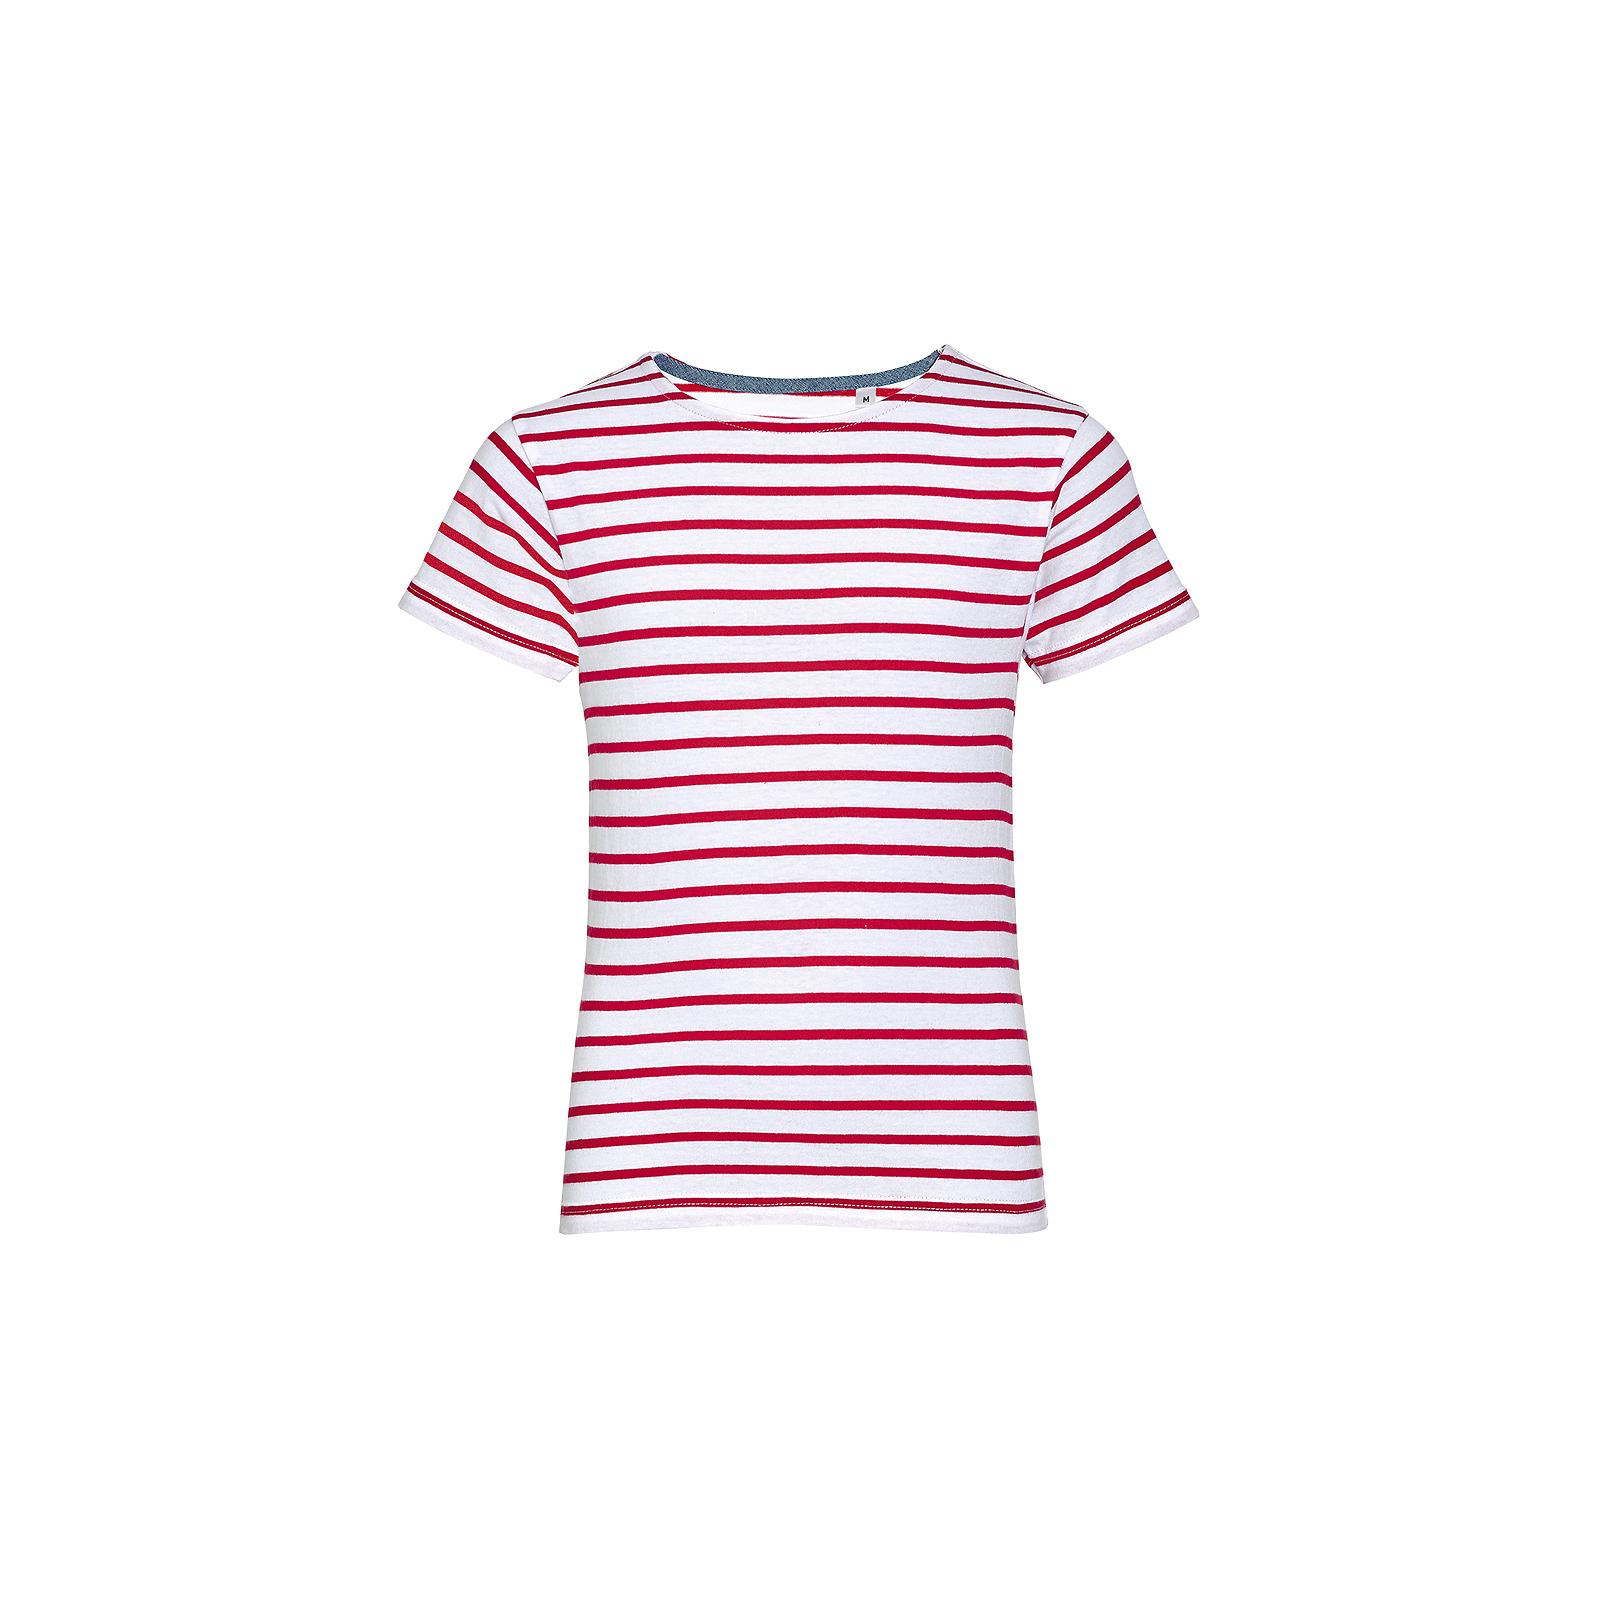 SOL/'S Kids Miles Stripe Short Sleeve T-Shirt Taped Neck Boys Girls Casual Summer